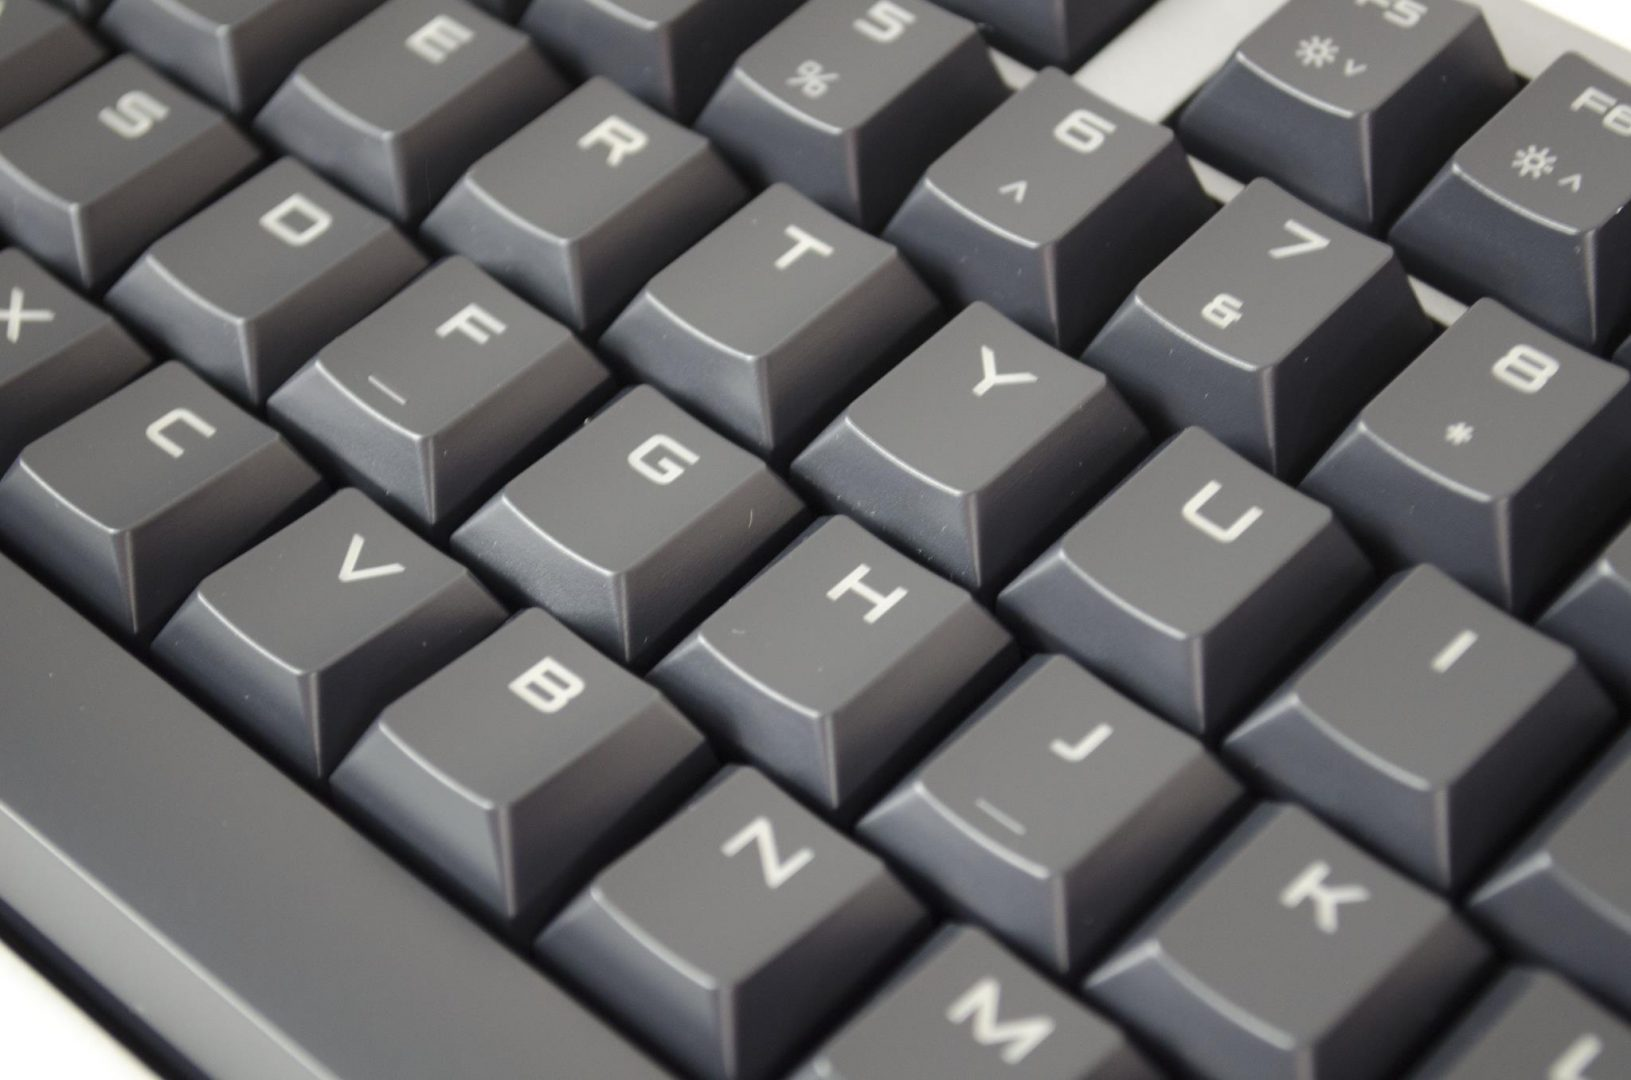 cherry mx-board 6 mechanical keyboard review_12